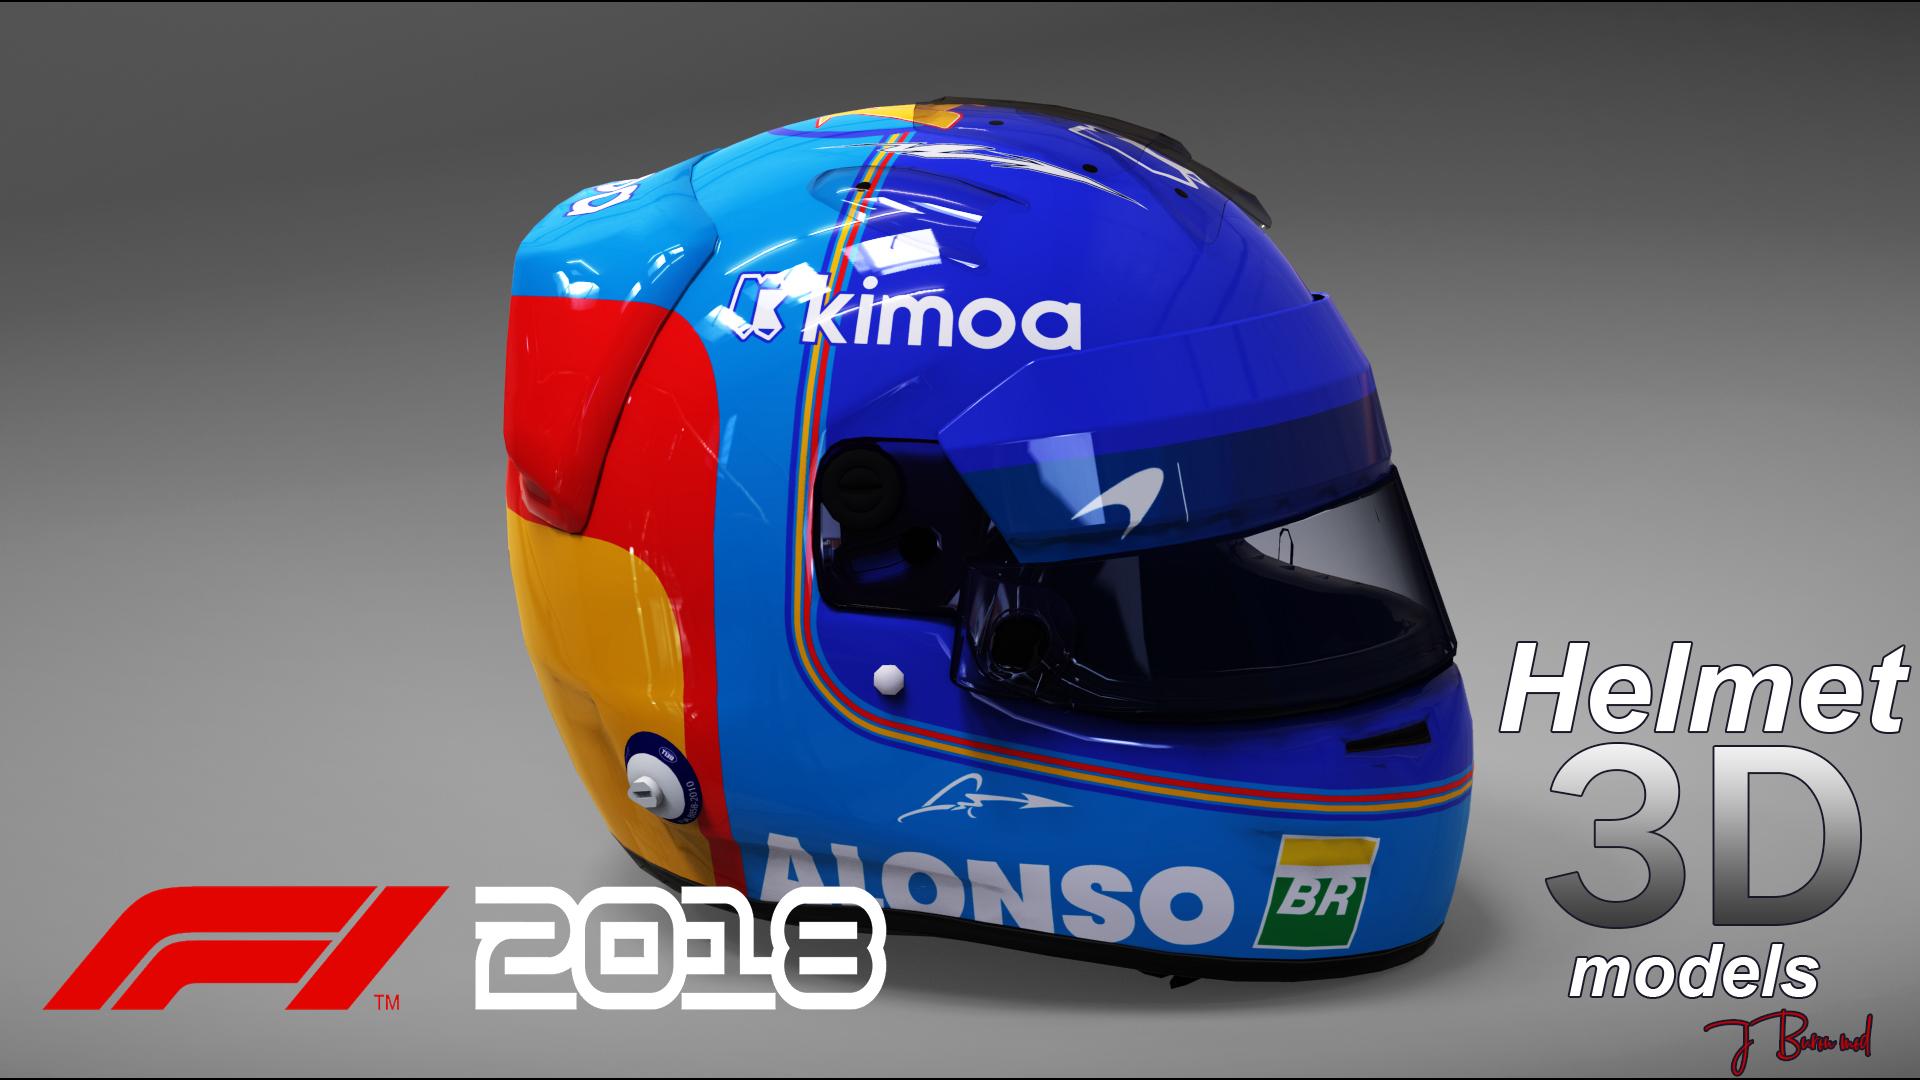 2018_helmet_3d_models_1.jpg